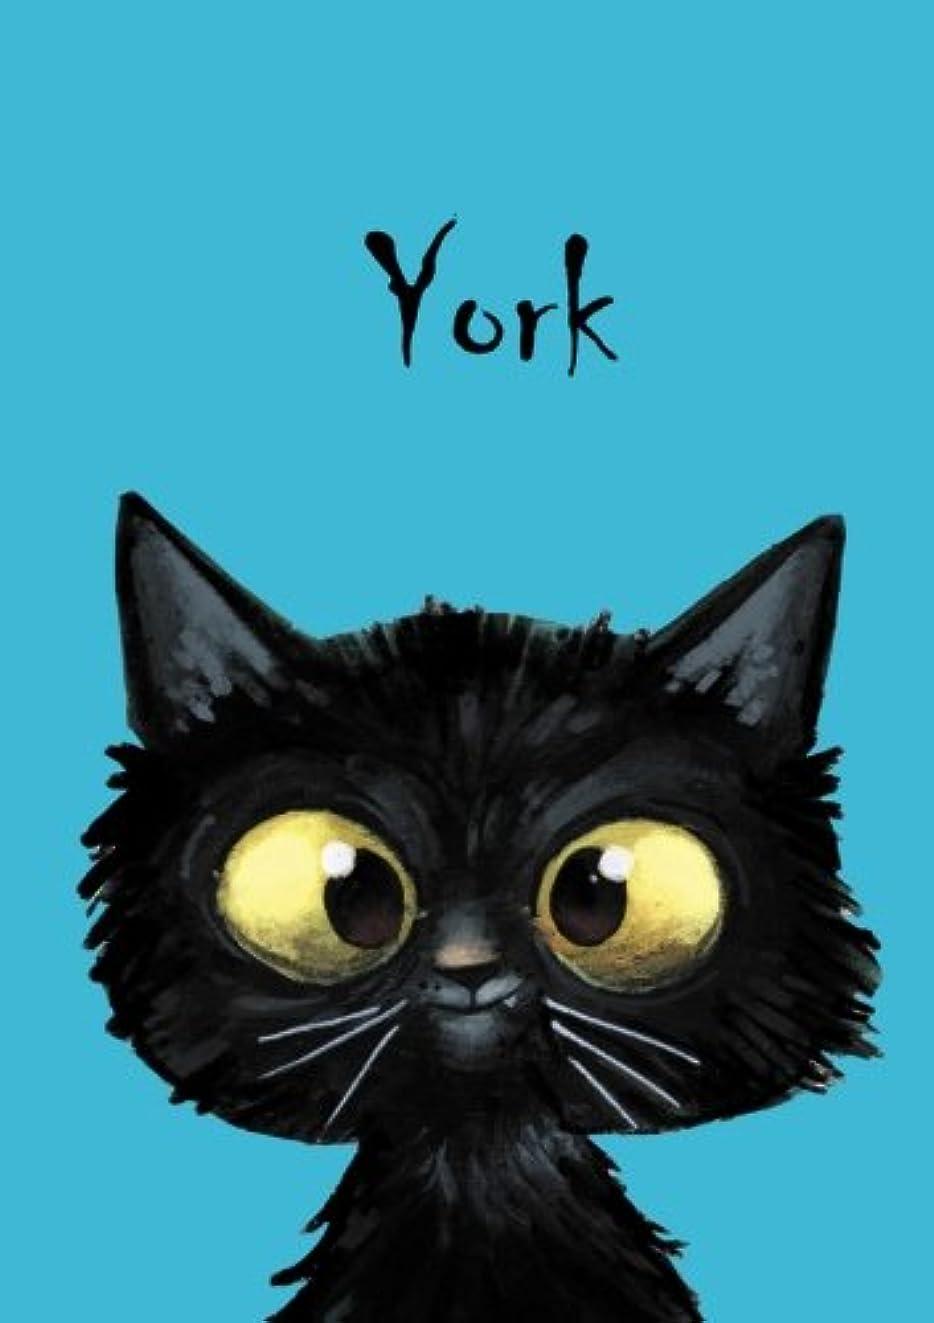 知覚的センブランス酸度York: York - Katzen - Malbuch / Notizbuch / Tagebuch: A5 - blanko